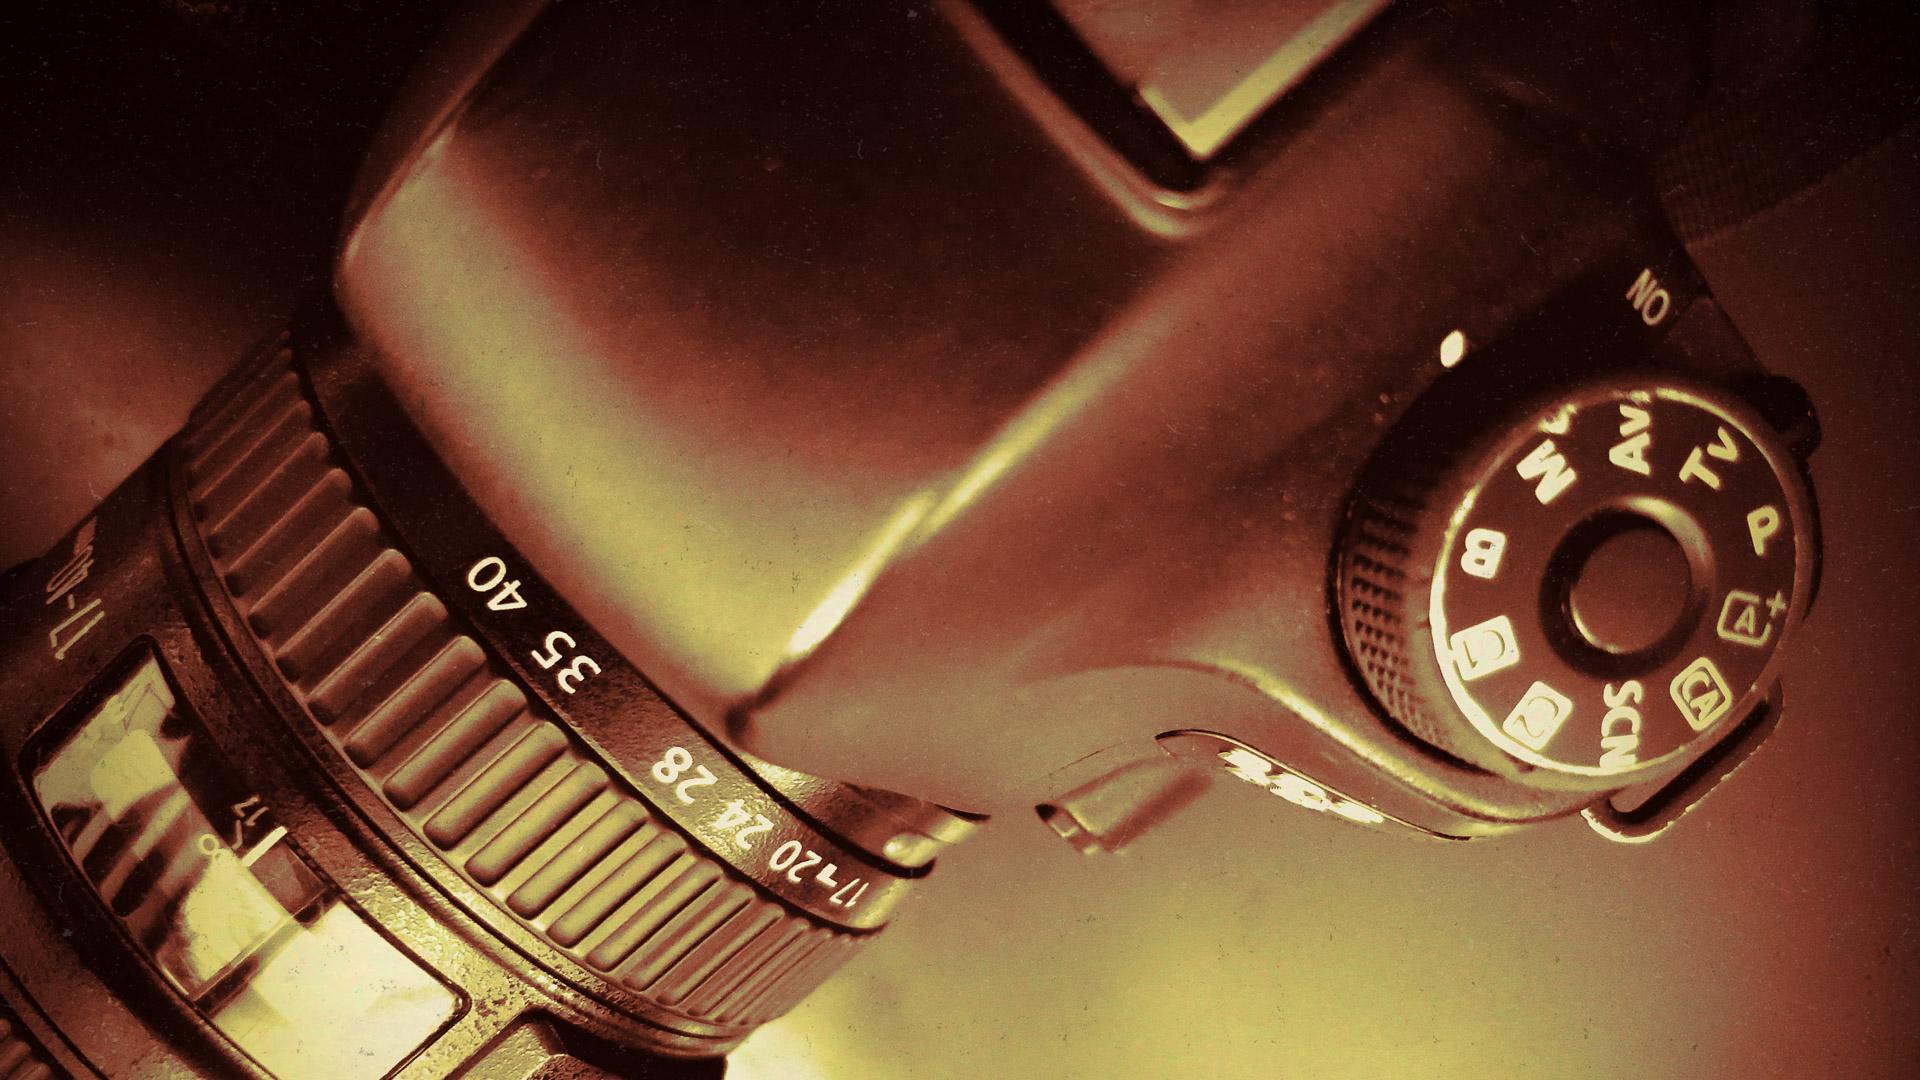 The nontechnical photographer